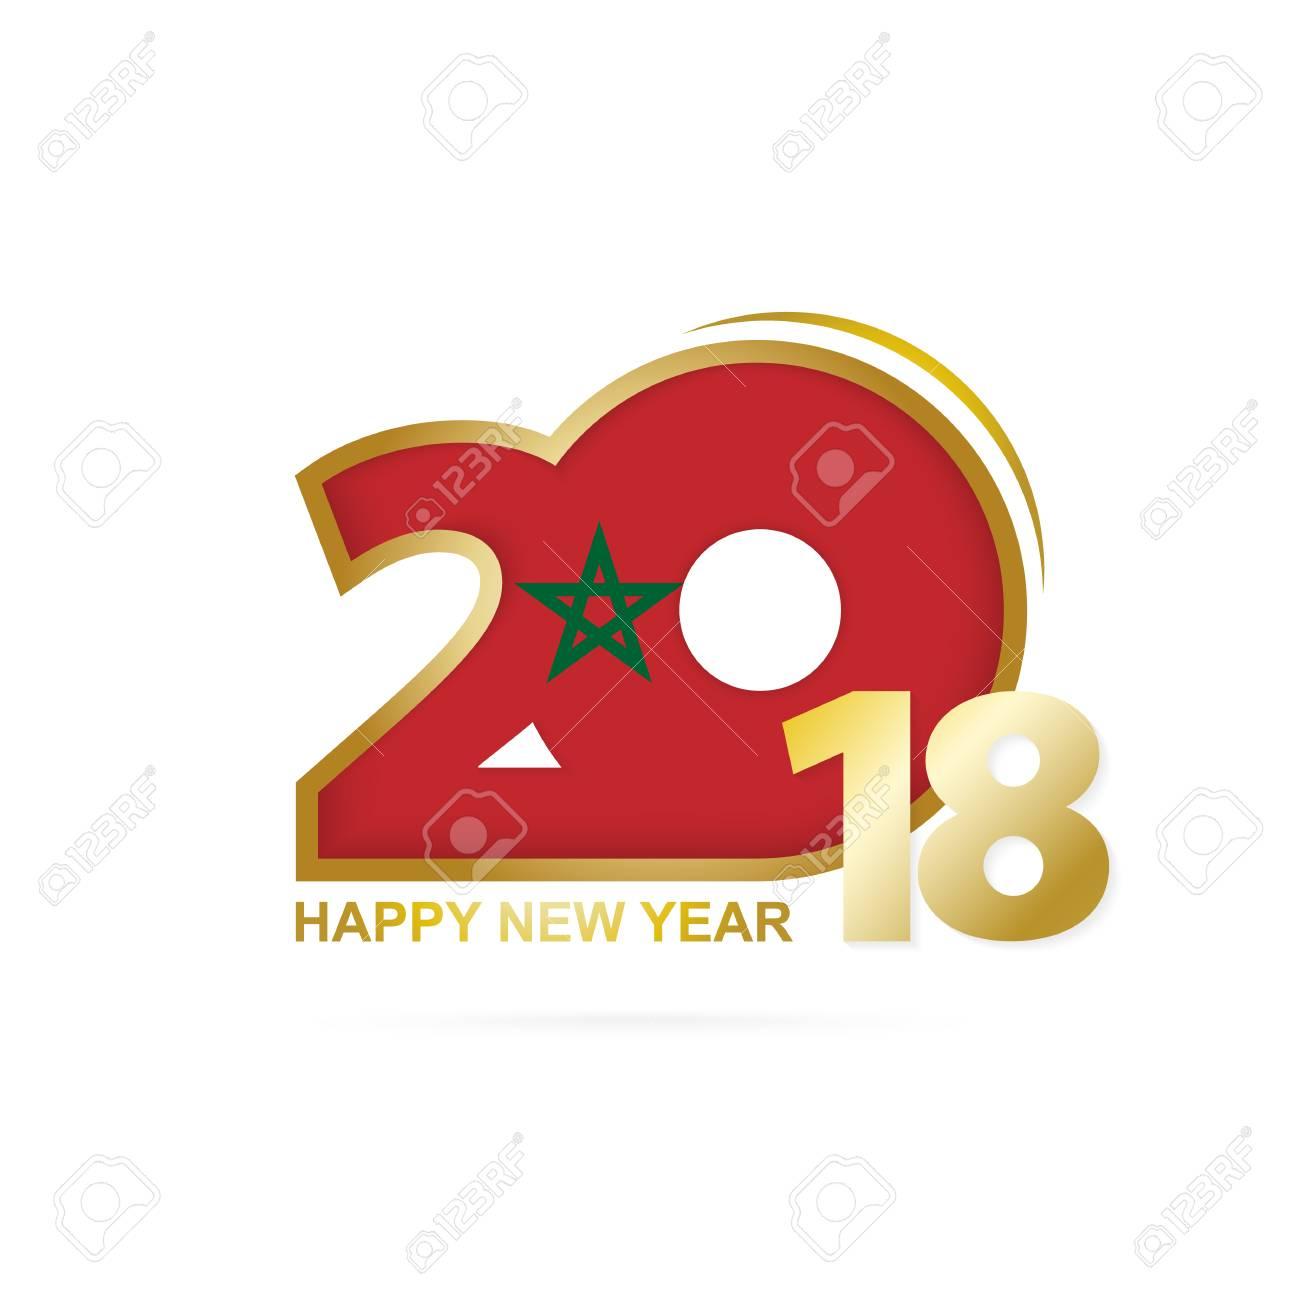 Year 2018 Happy New Year Design illustration. - 87571112